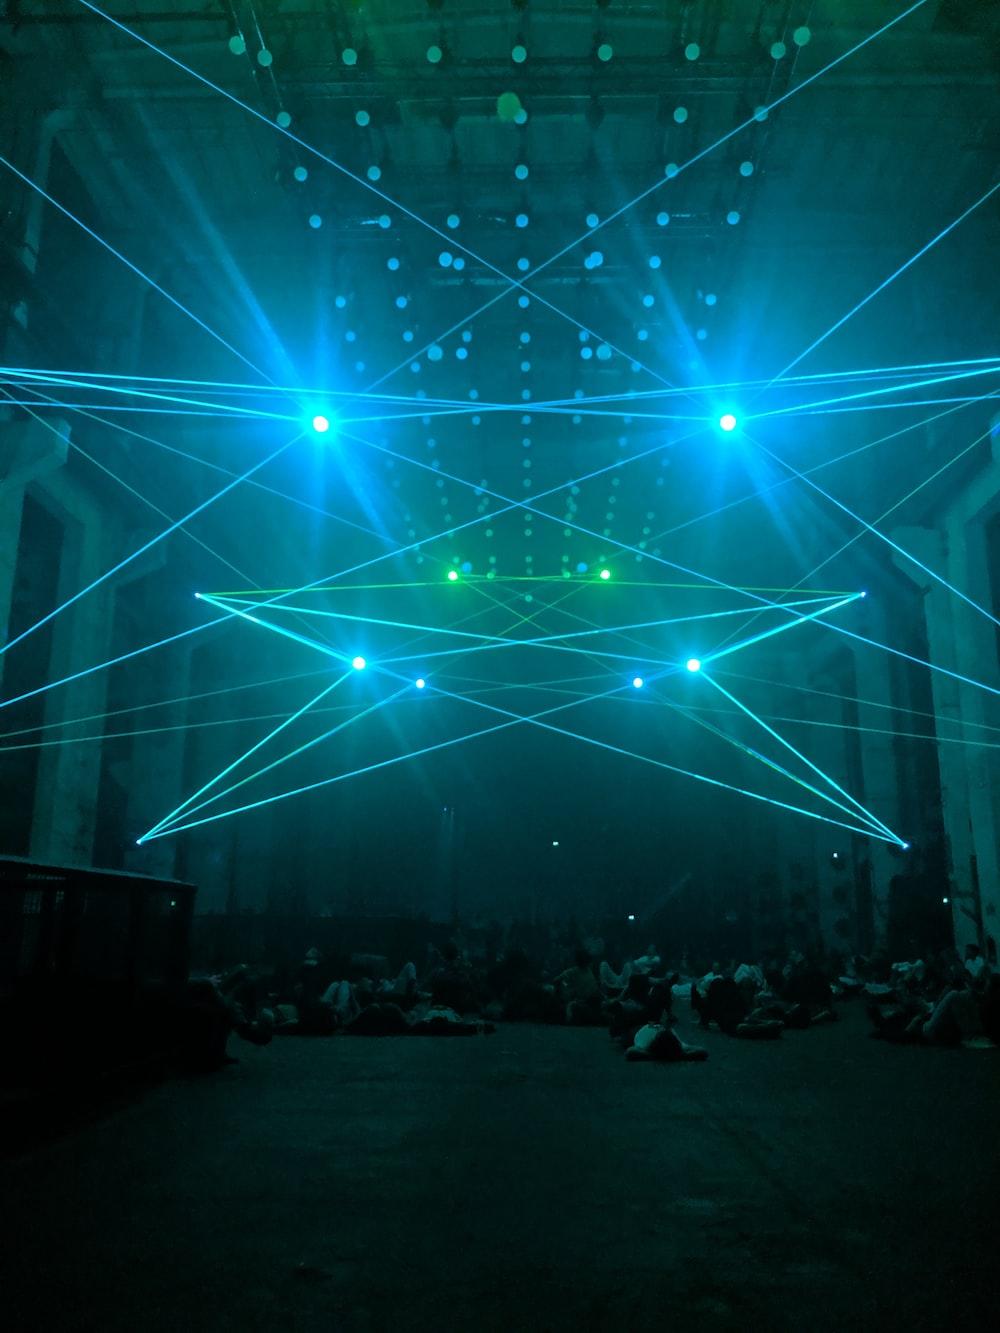 turned-on green lights